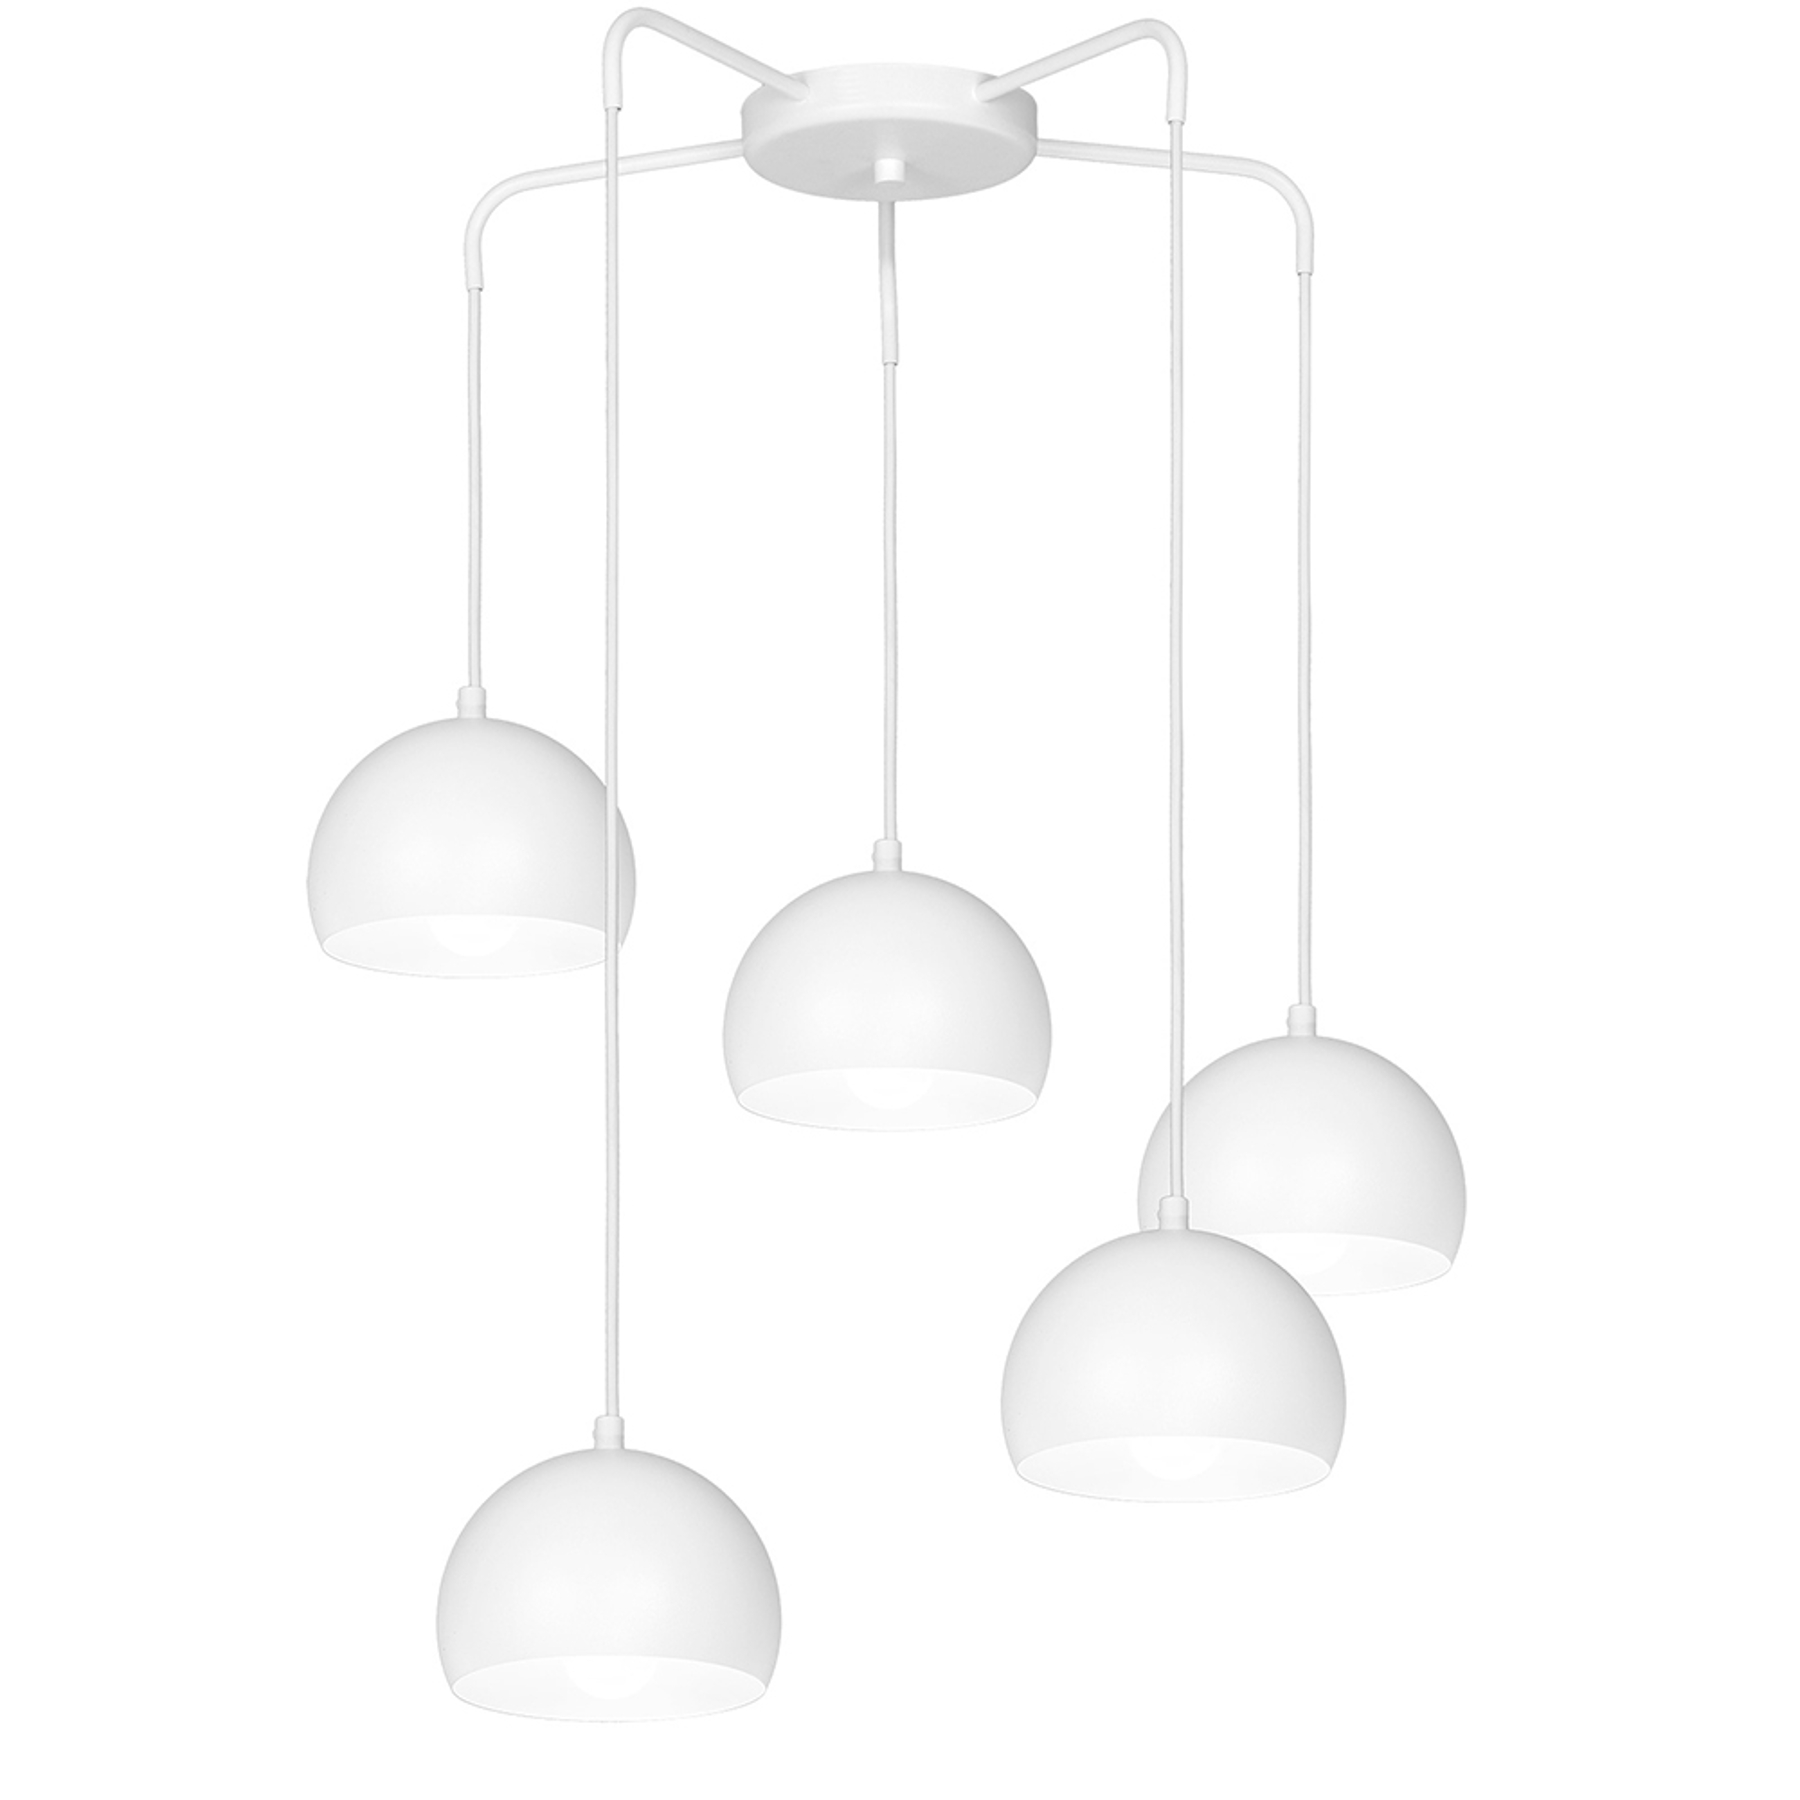 Hanglamp Sool, wit, 5-lamps